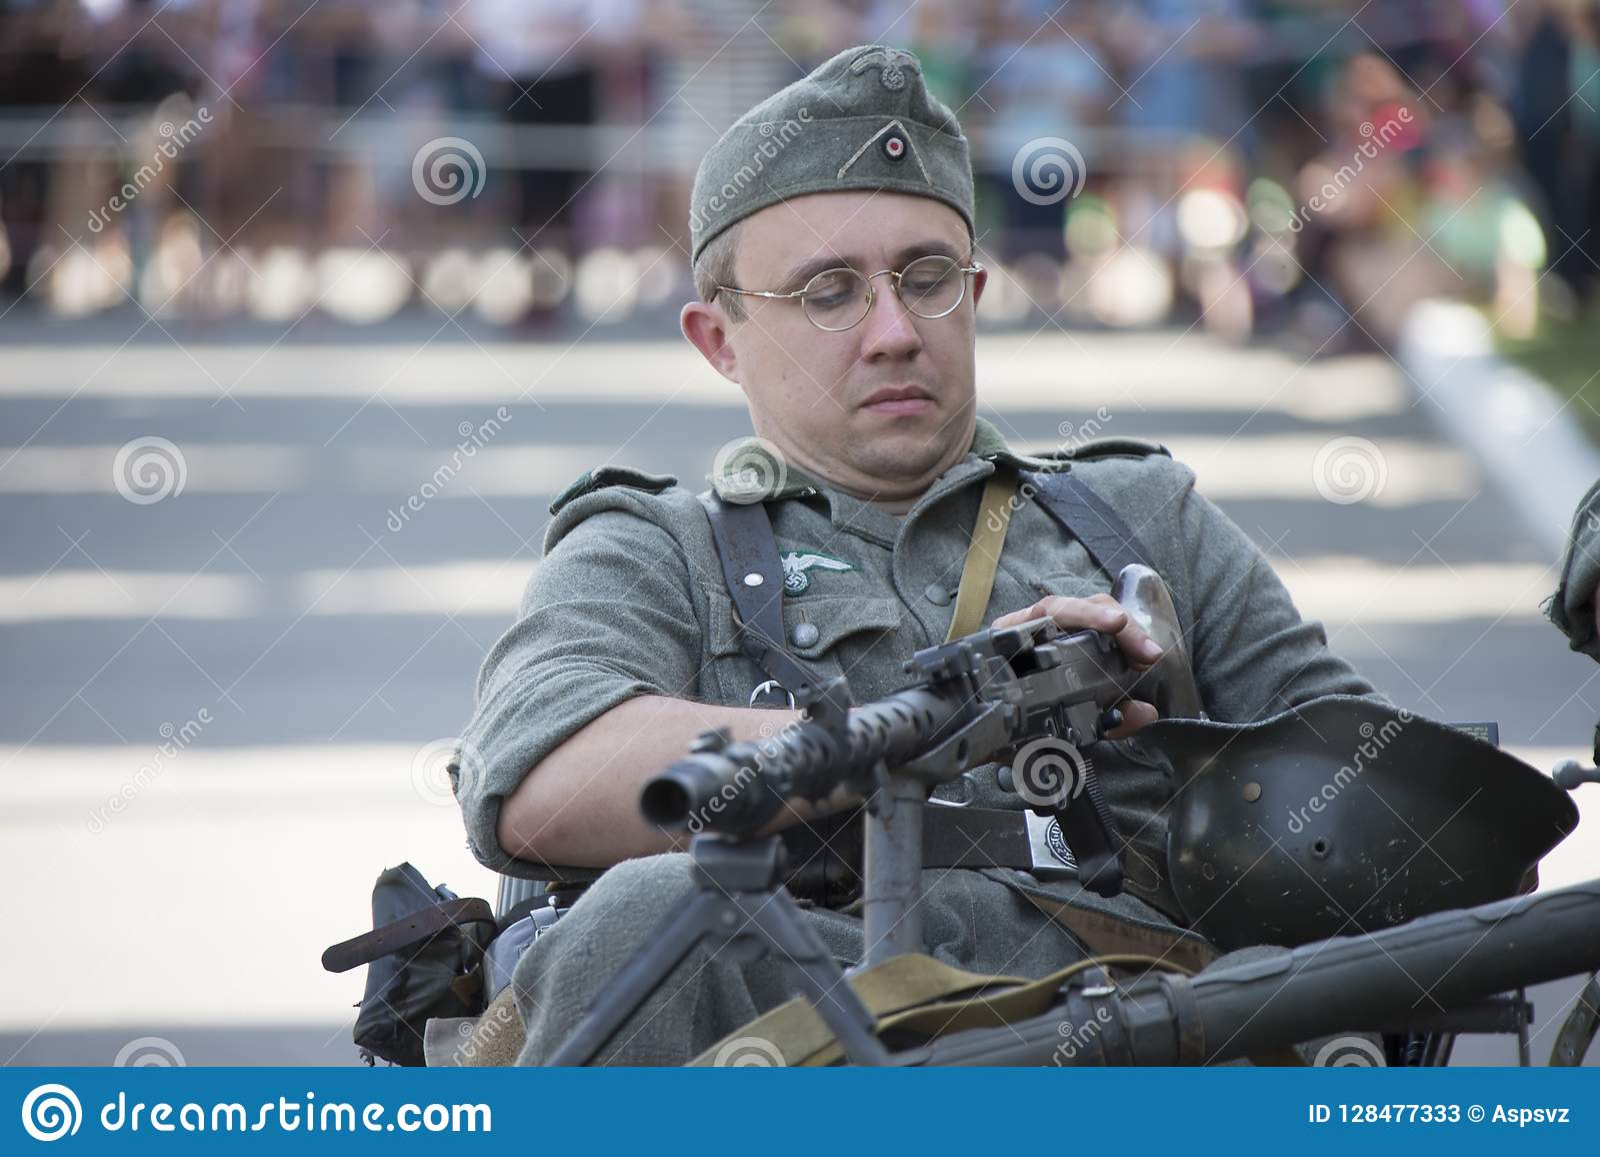 Portrait of a German soldier Stock Photo - Alamy